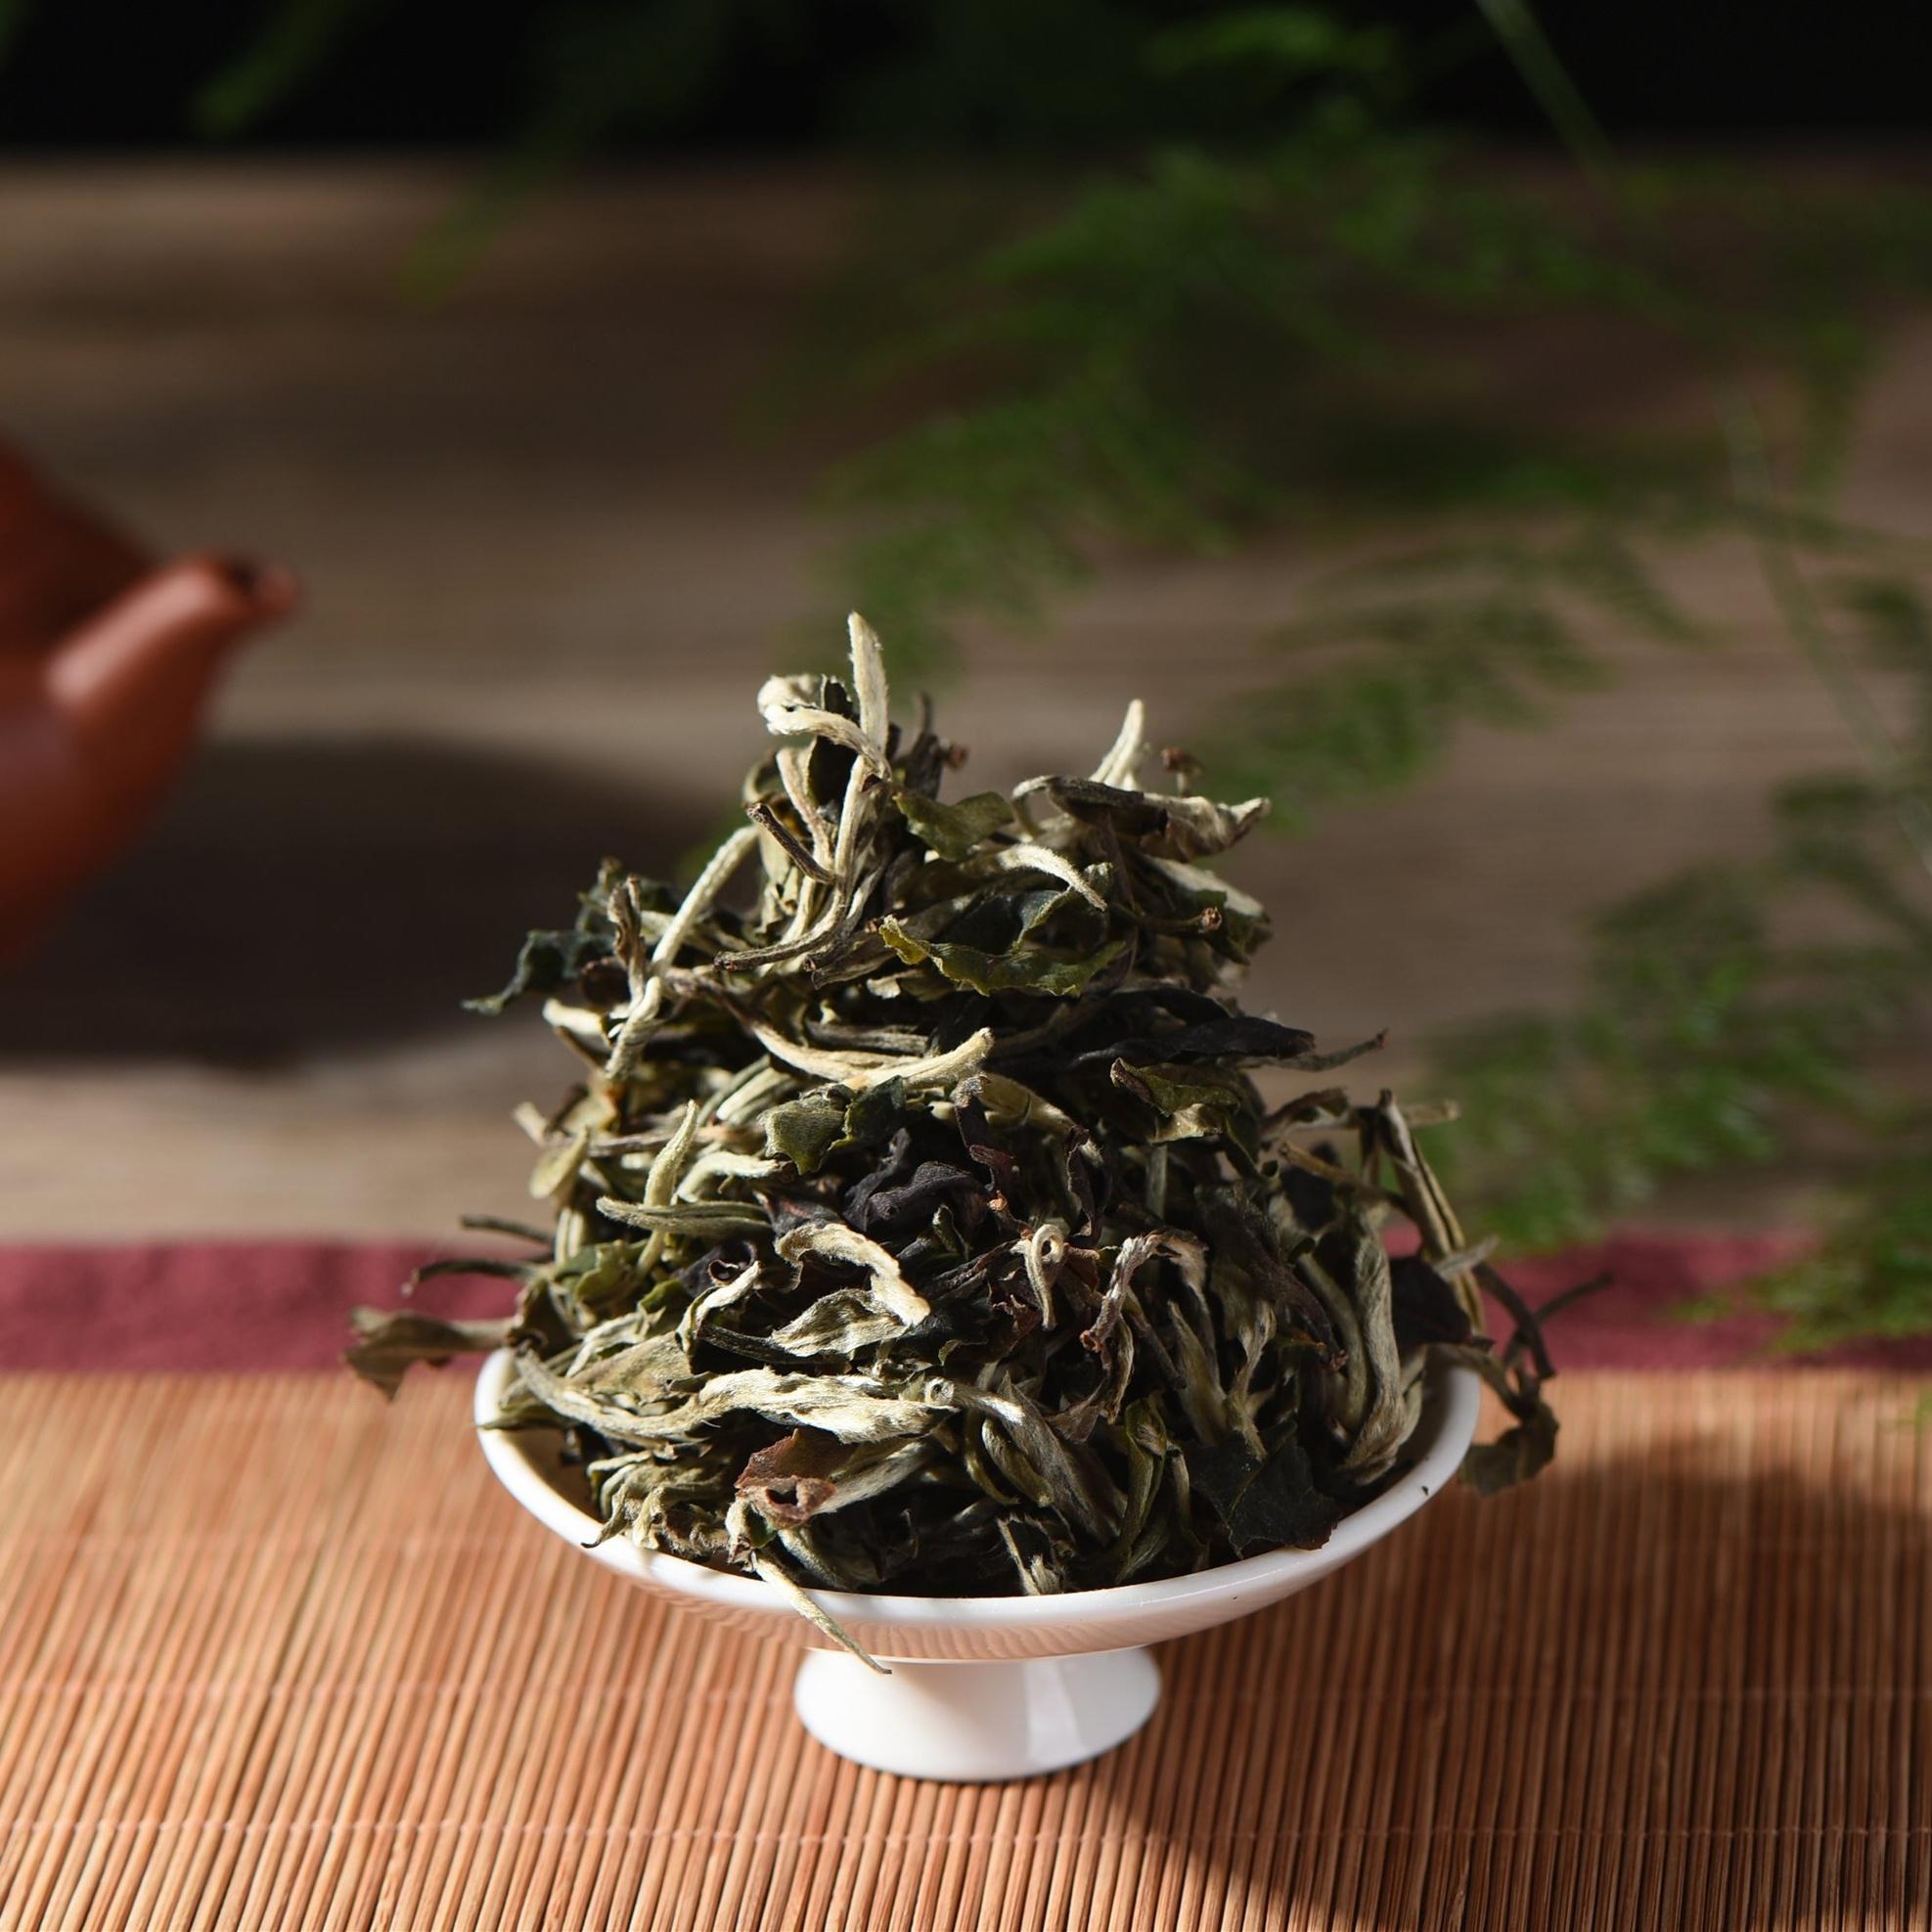 OEM yunnan high mountain white sliver needle loose leaf slimming tea - 4uTea | 4uTea.com